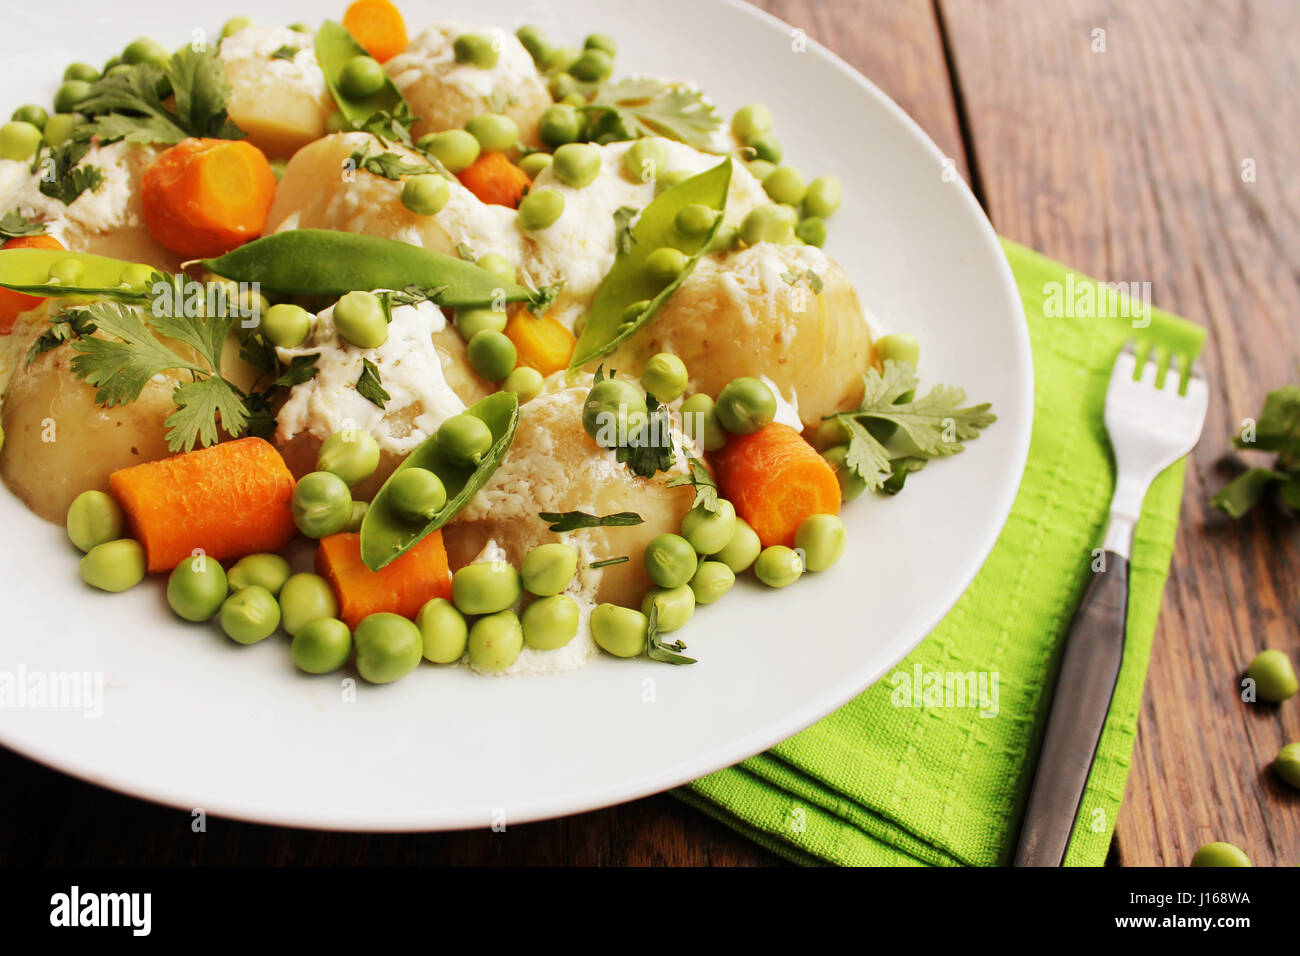 Potato salad with carrots, peas and coriander - Stock Image